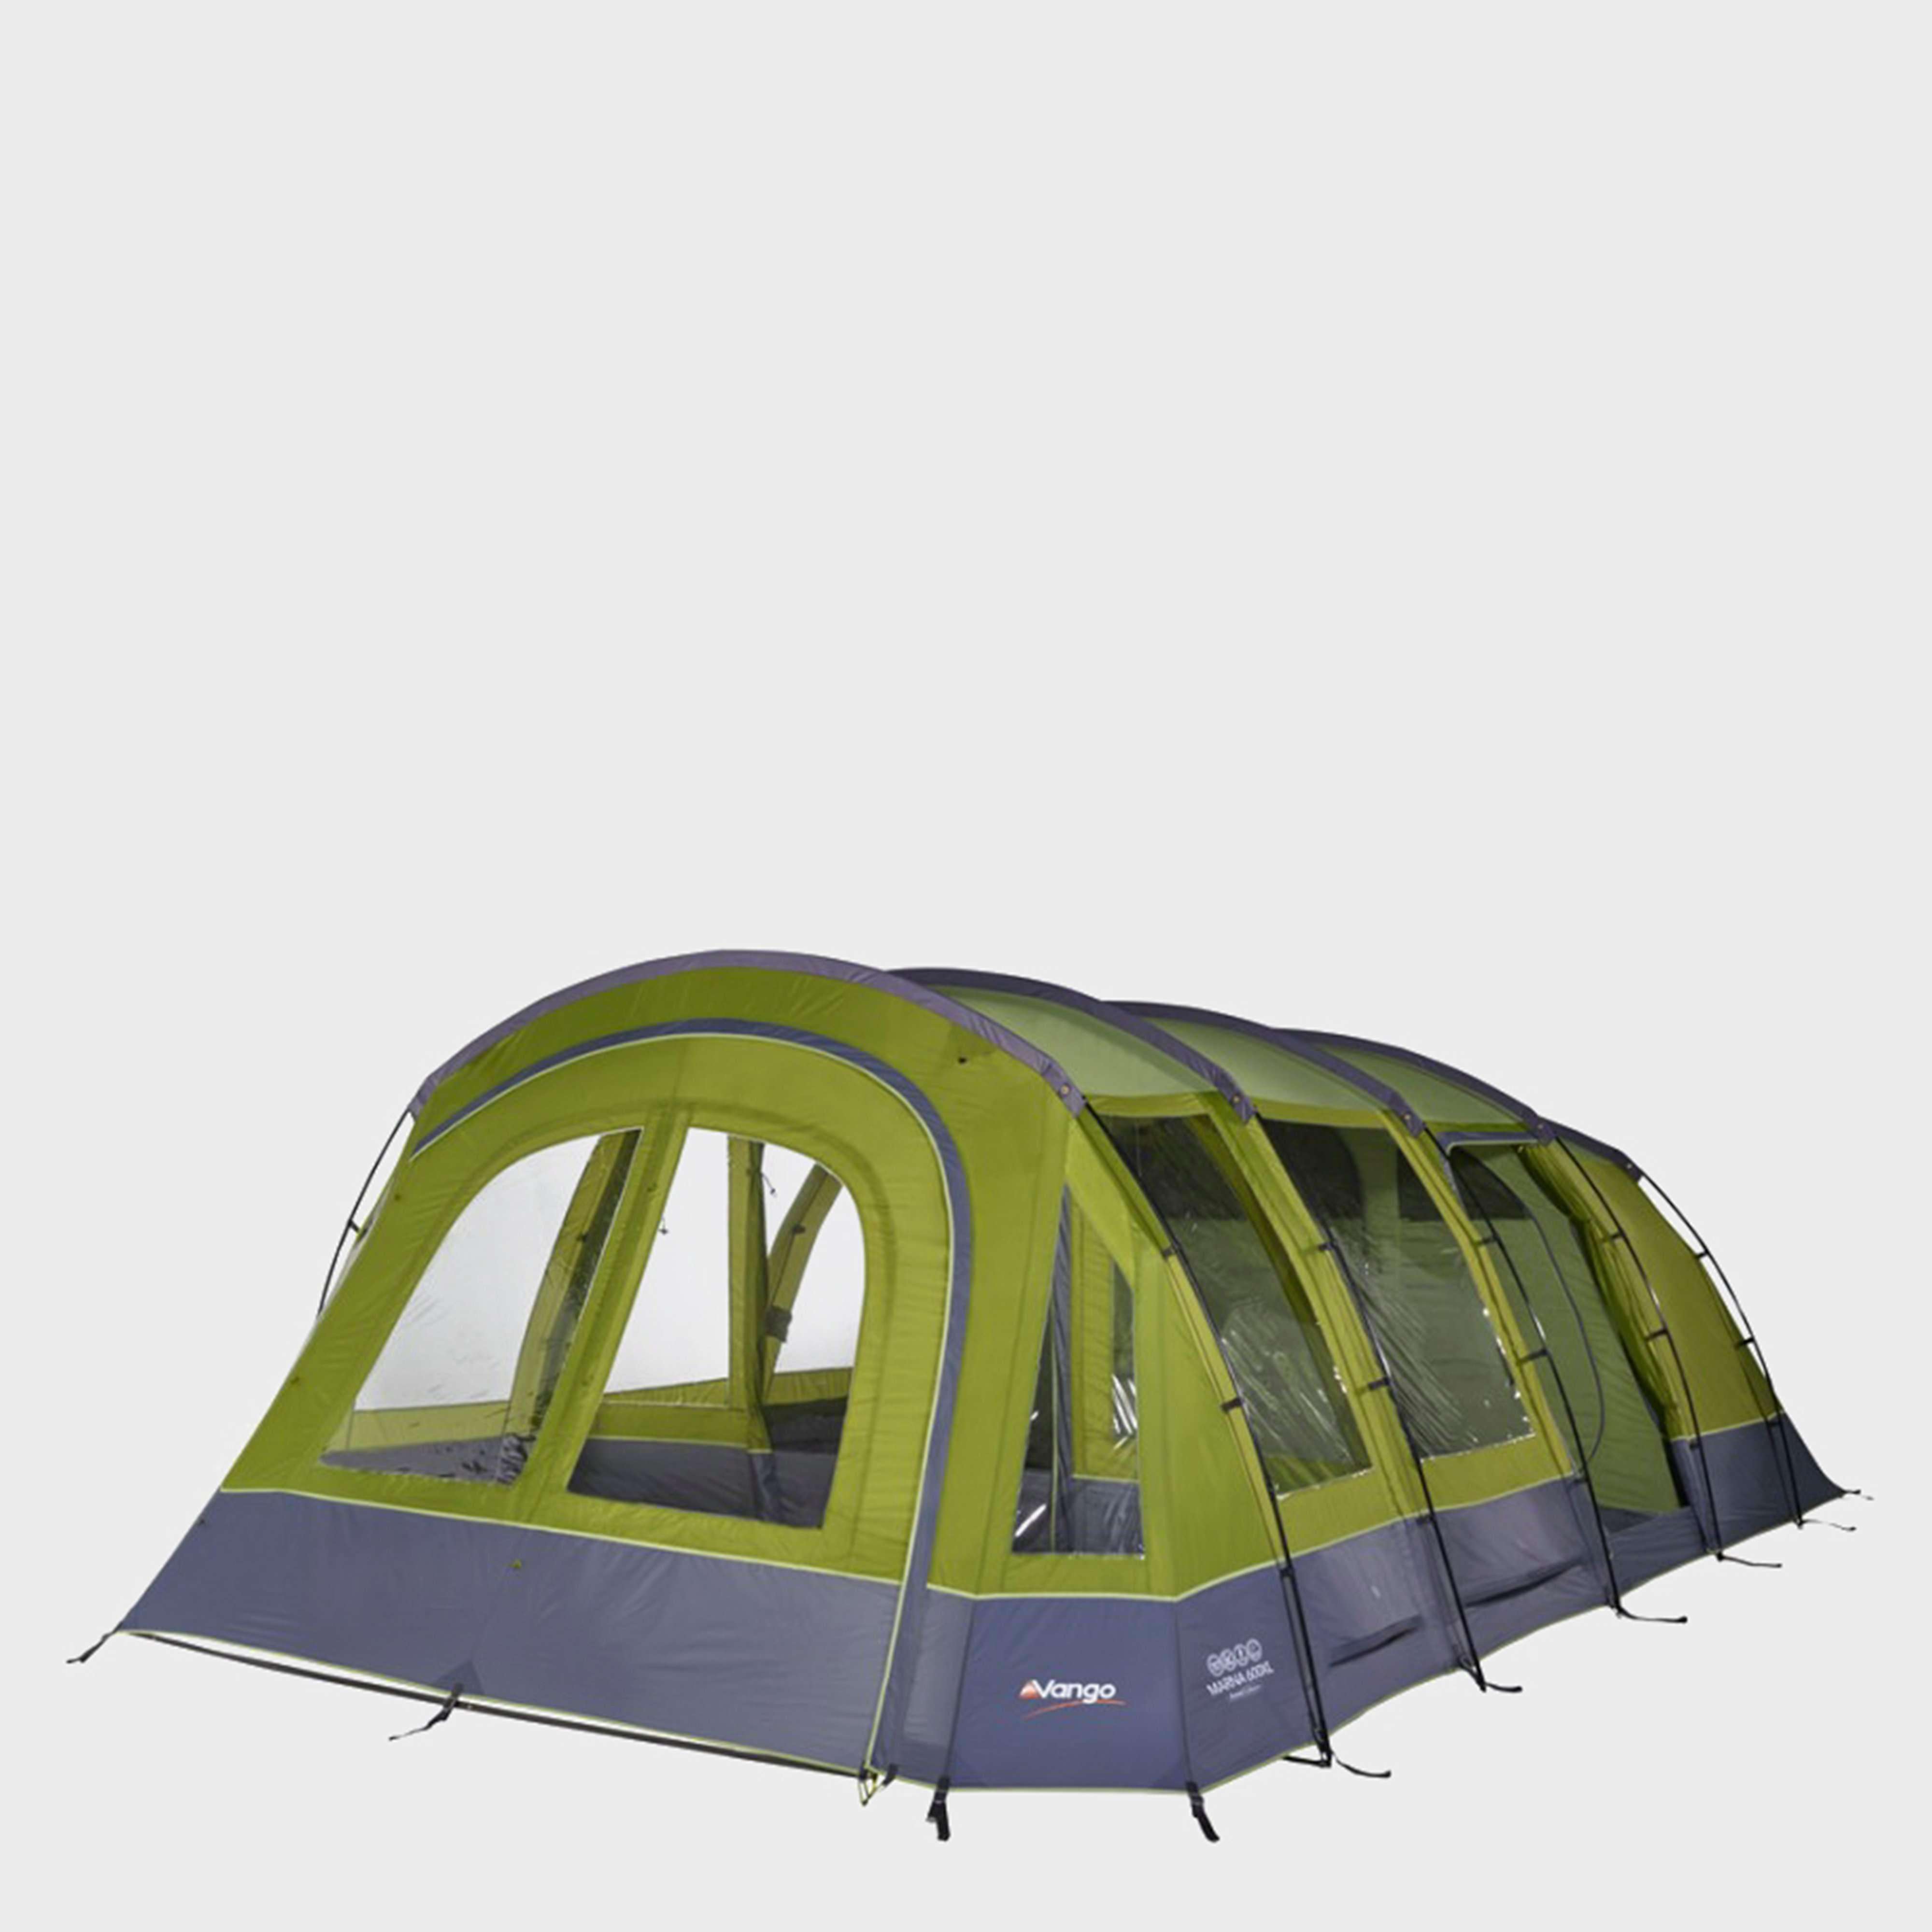 VANGO Marna 600XL Family Tent